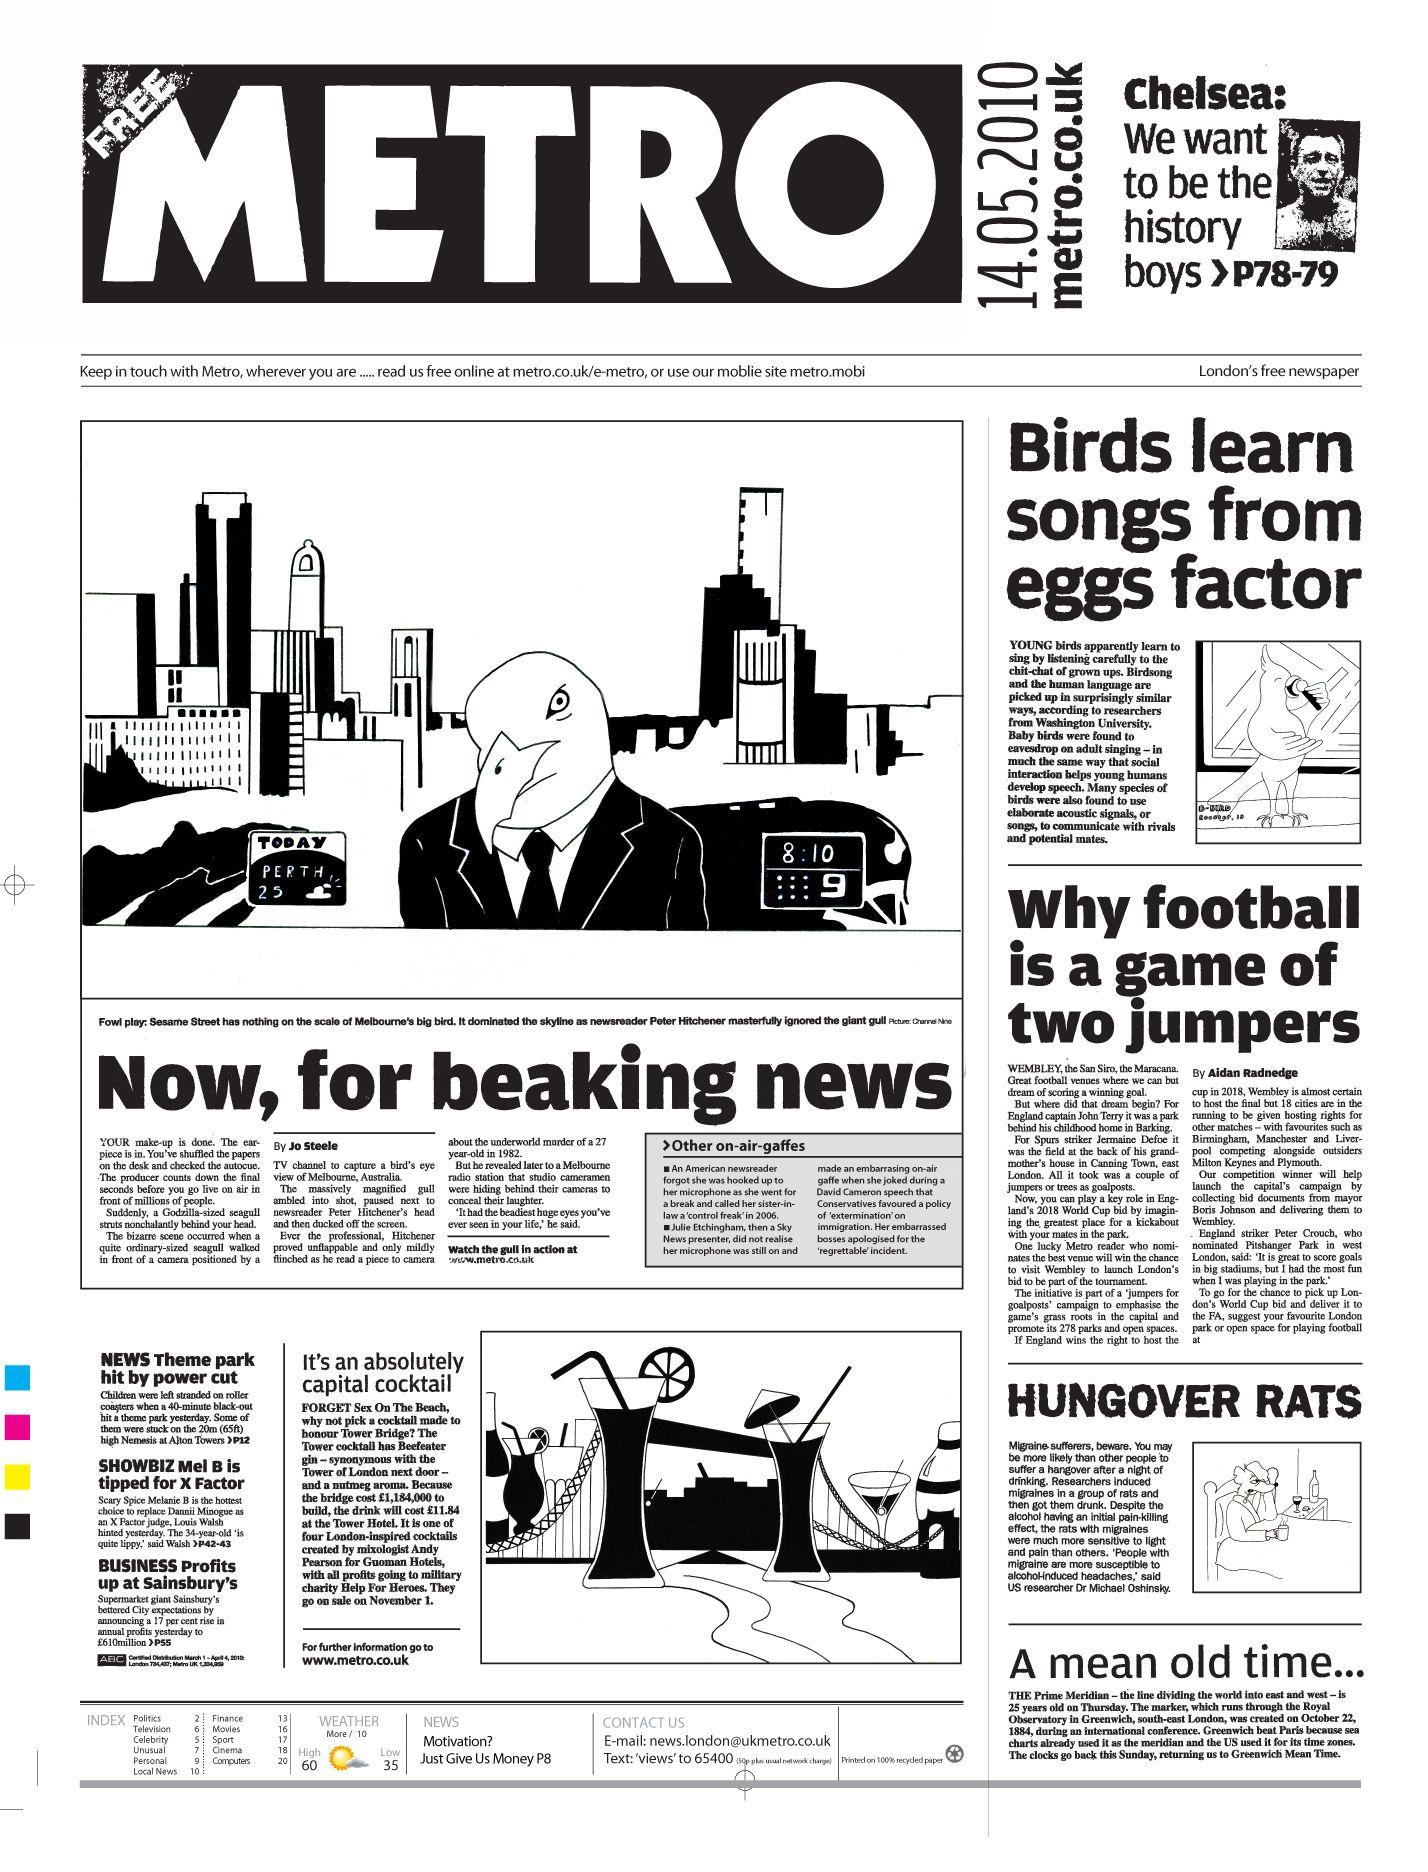 A newspaper layout